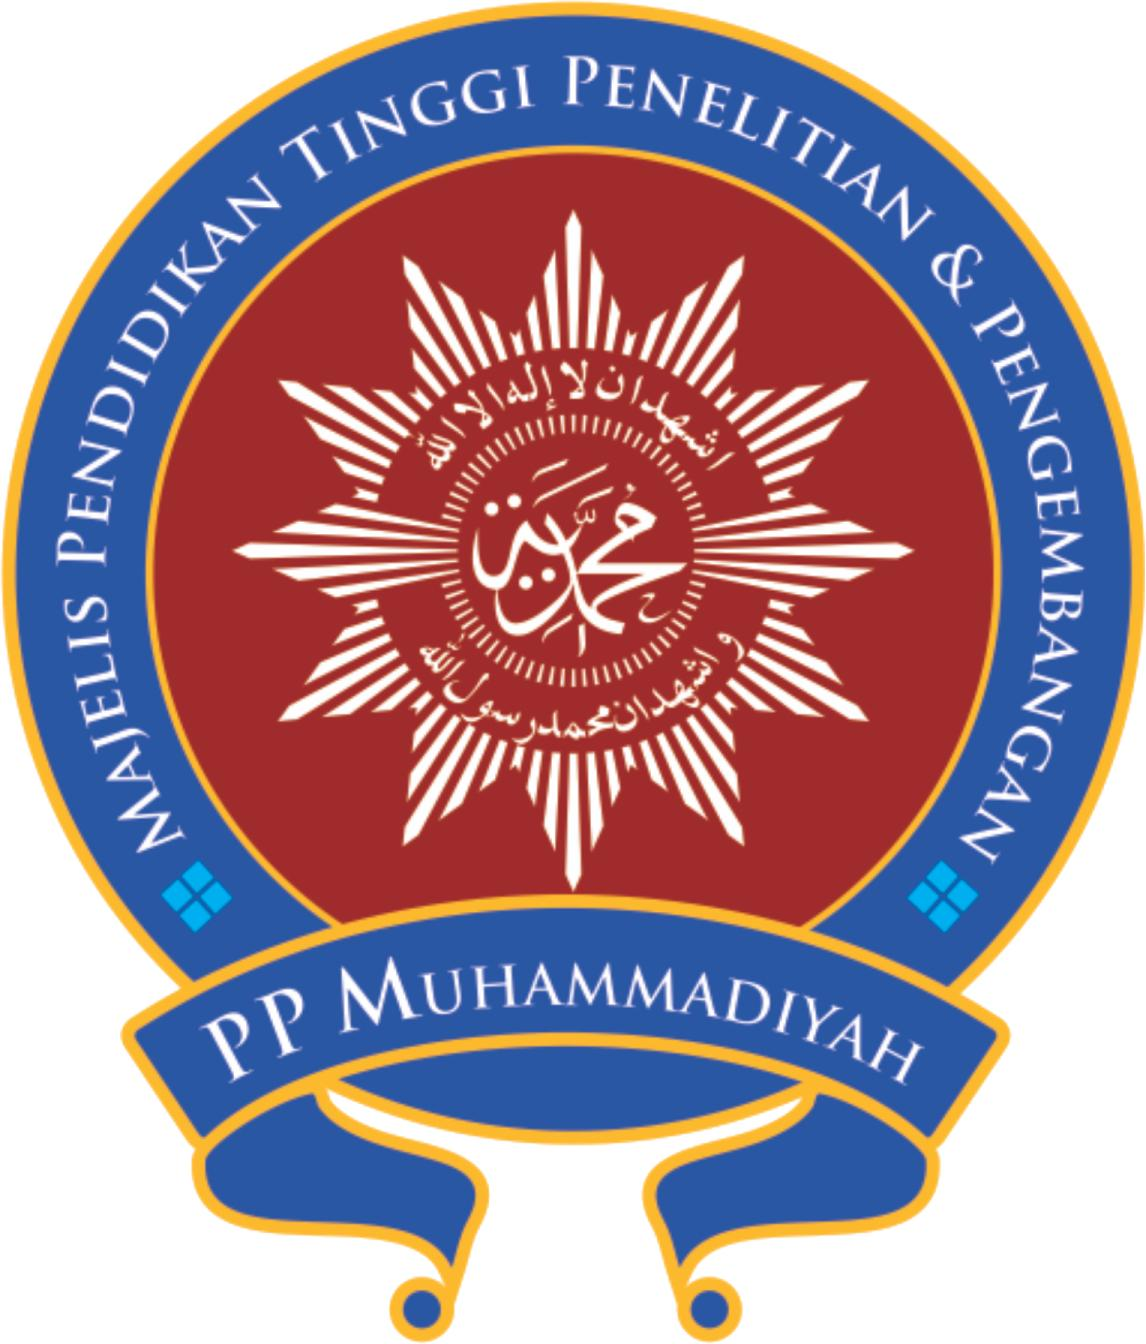 Majelis Diktilitbang Pp Muhammadiyah On Twitter Disave Mas Robby Karman Logo Majelis Diktilitbang D